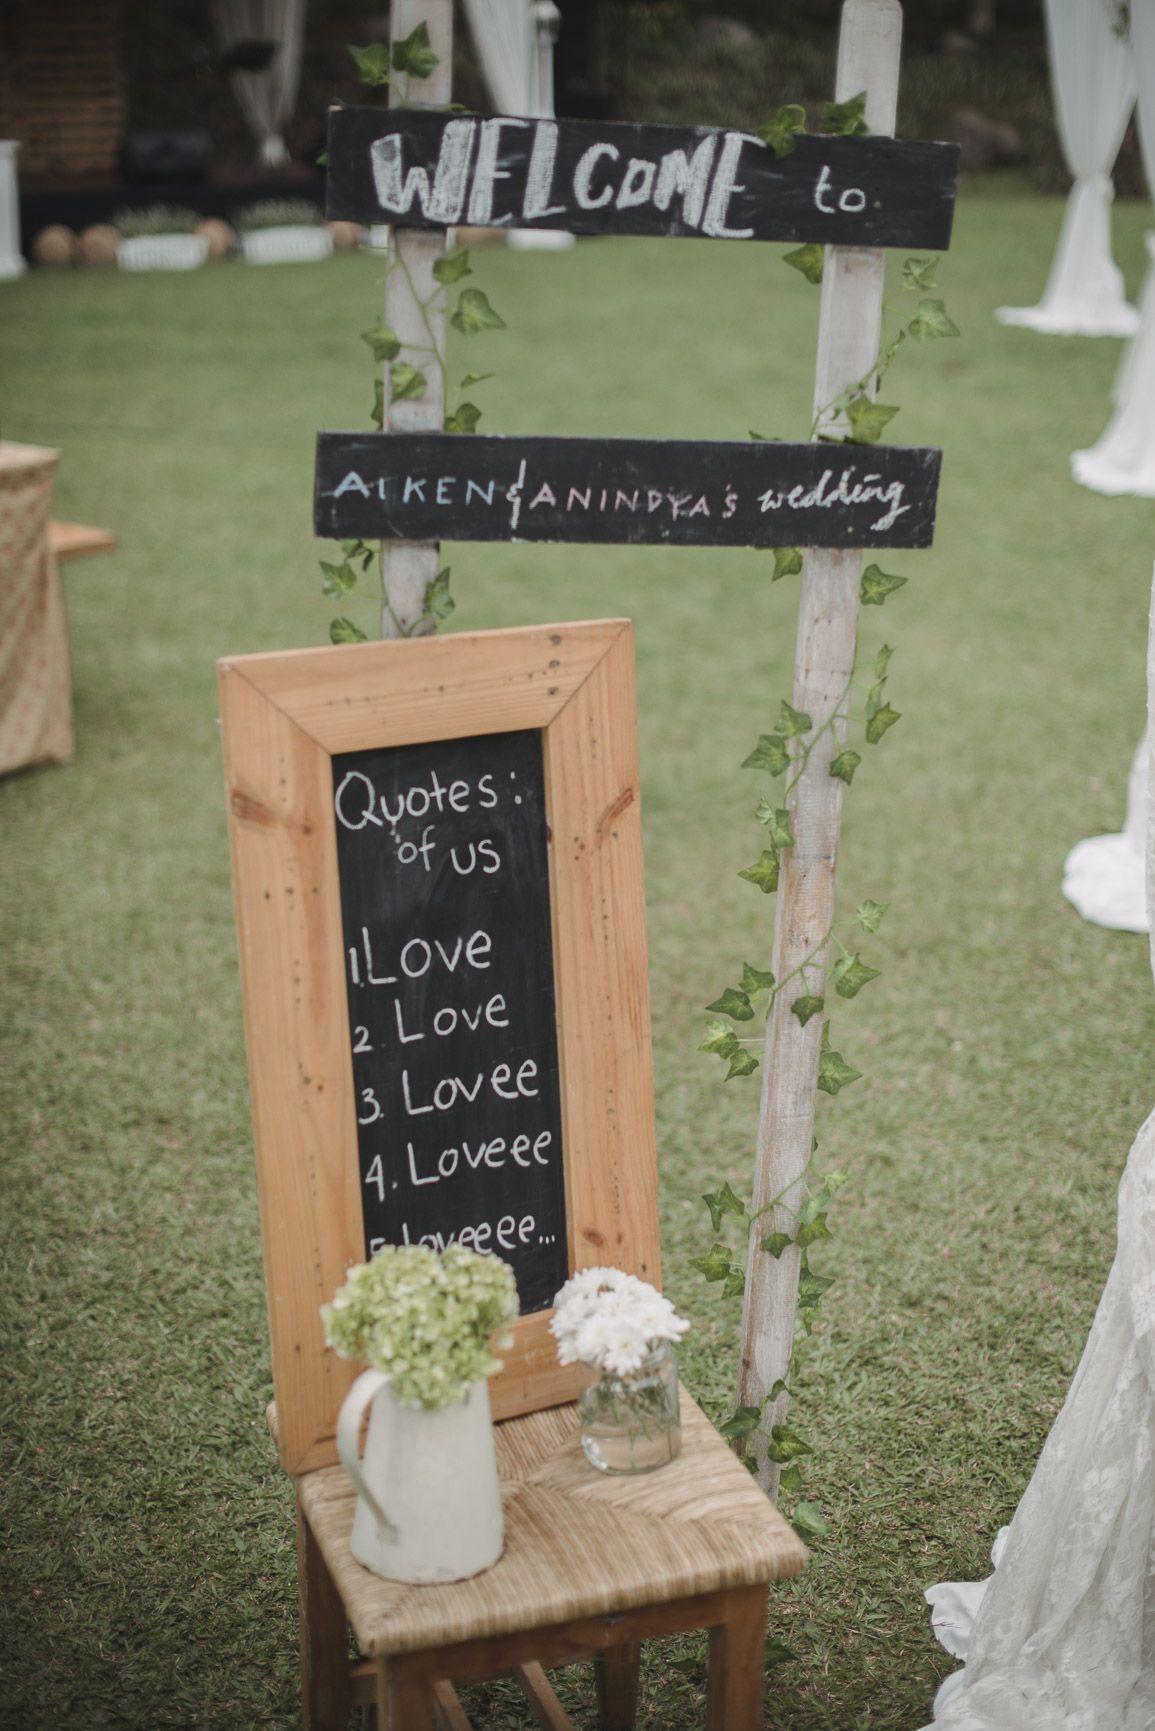 Outdoor wedding at gedong putih ala anindya and aiken owlsome 102 outdoor wedding at gedong putih ala anindya and aiken owlsome 102 of 167 junglespirit Images